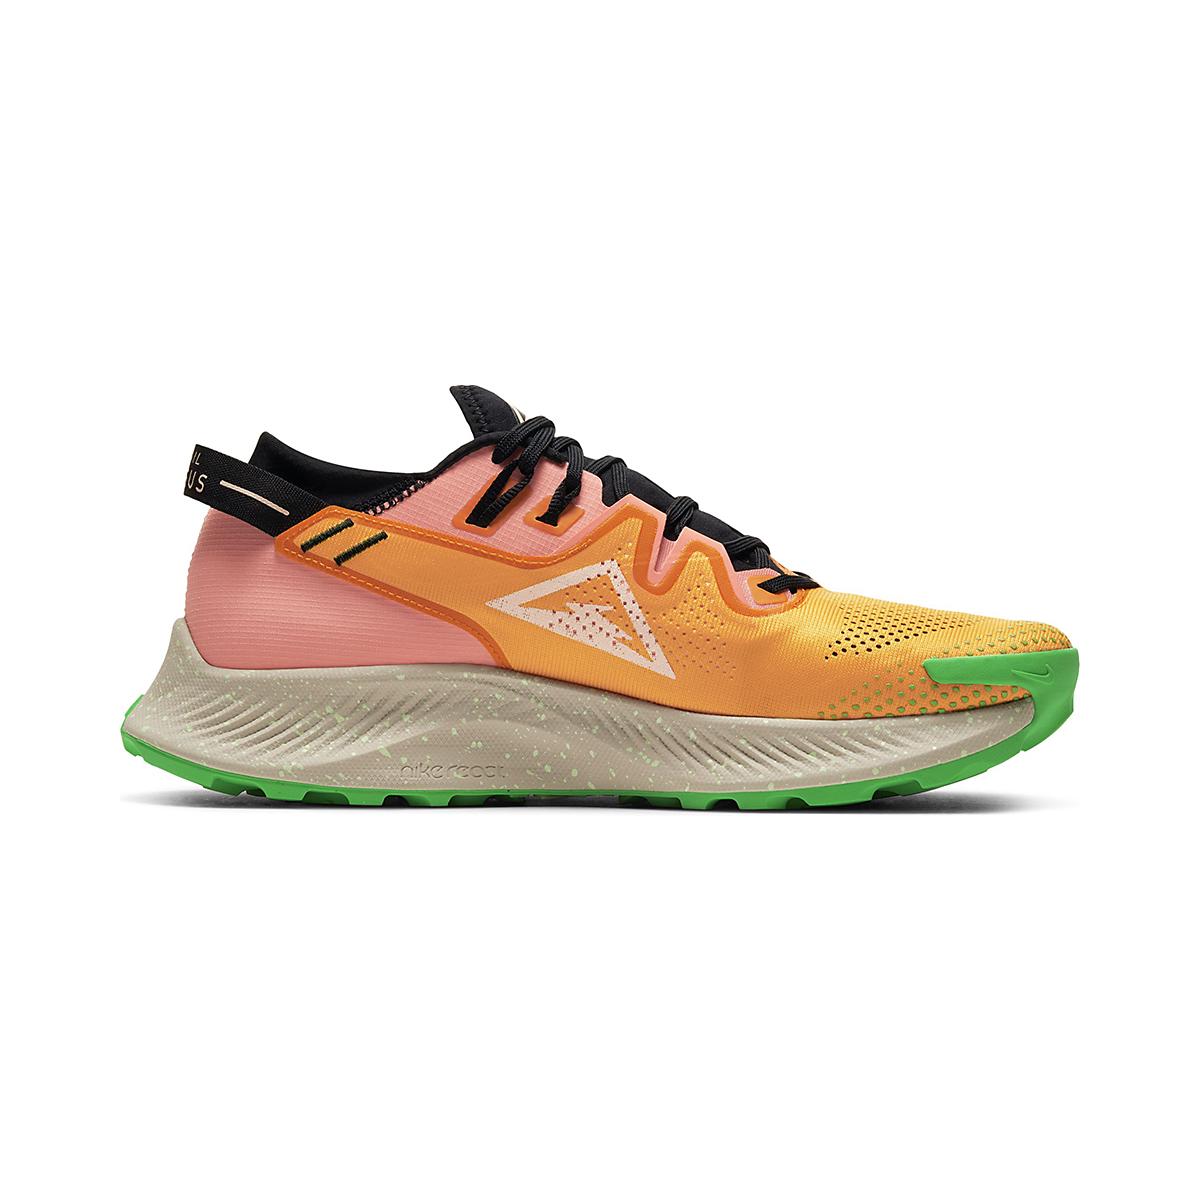 Men's Nike Pegasus Trail 2 Trail Running Shoe - Color: Kumquat/Crimson - Size: 6 - Width: Regular, Kumquat/Crimson, large, image 1